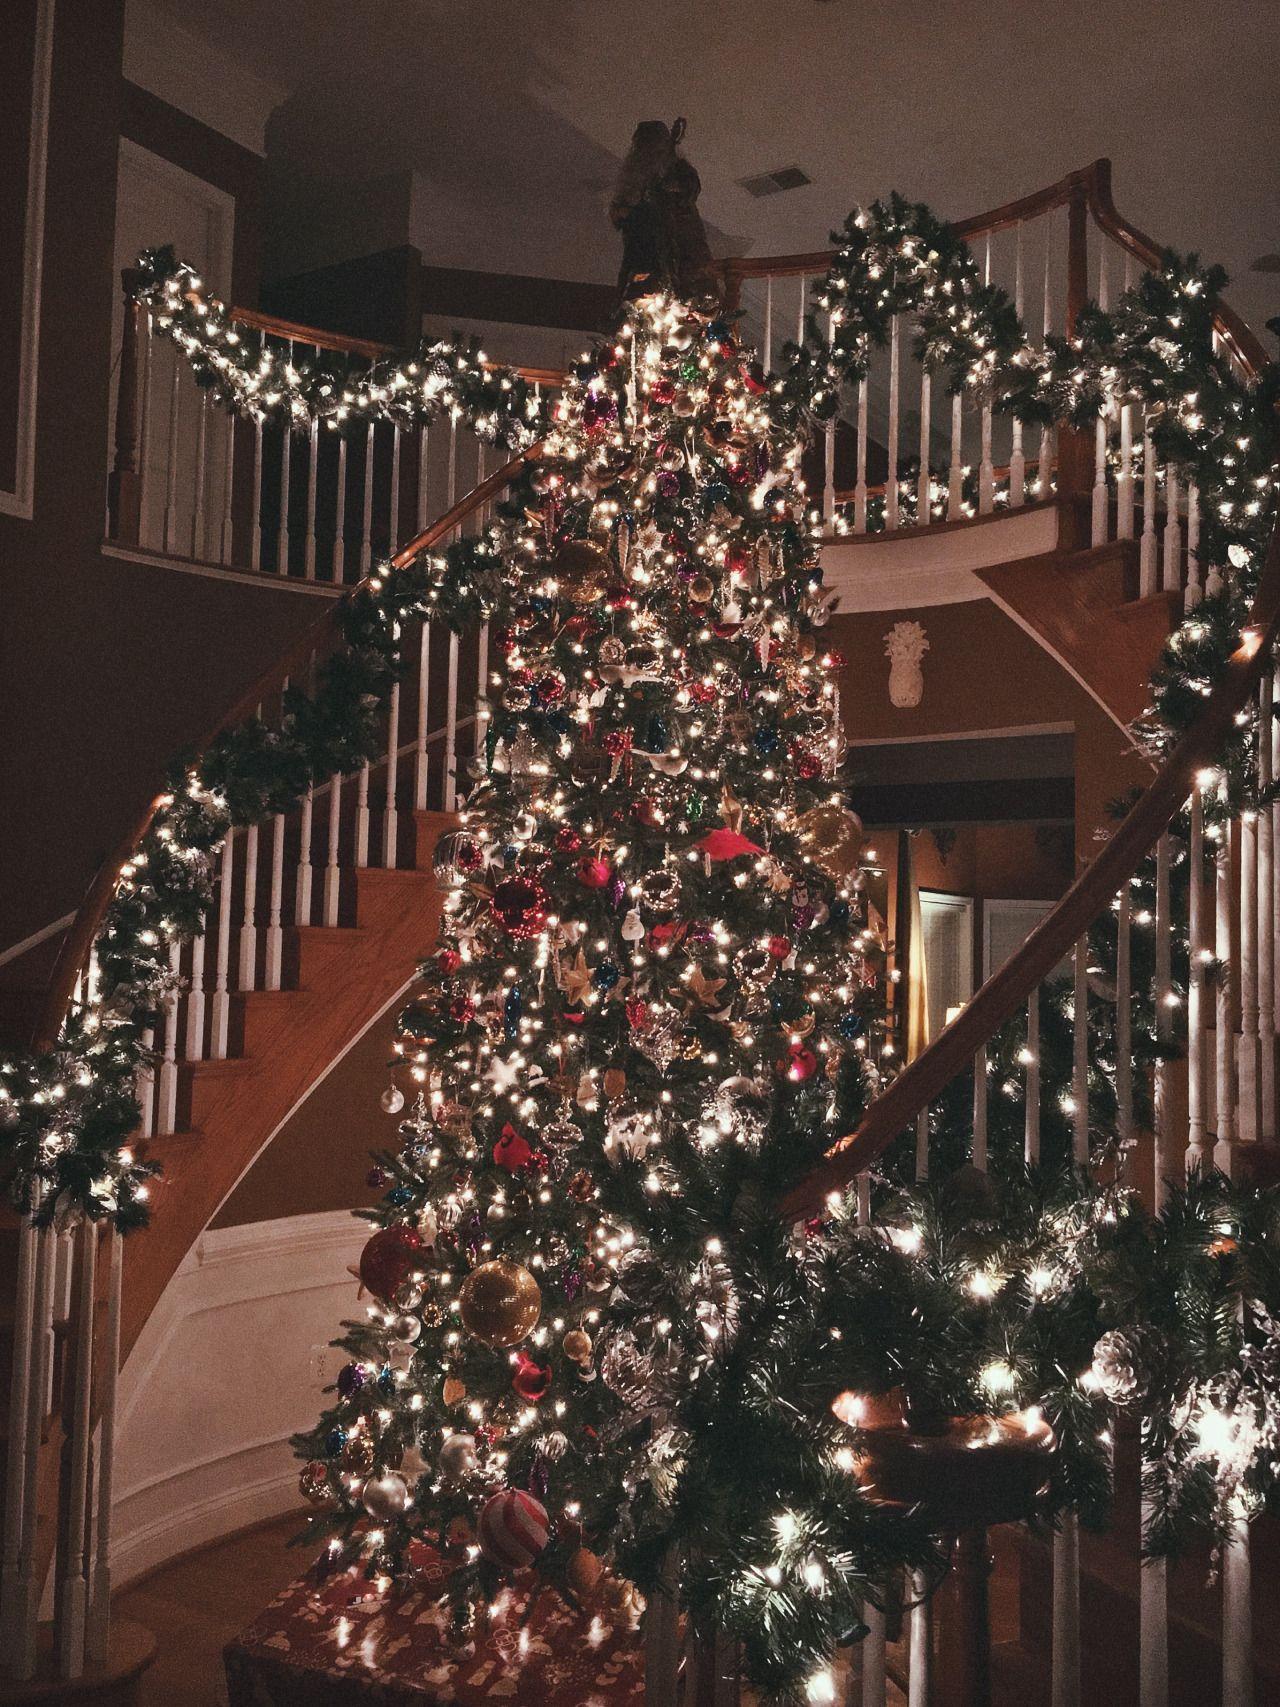 Pin by victoria borelli on christmas obsessed - Dekorationsideen weihnachten ...